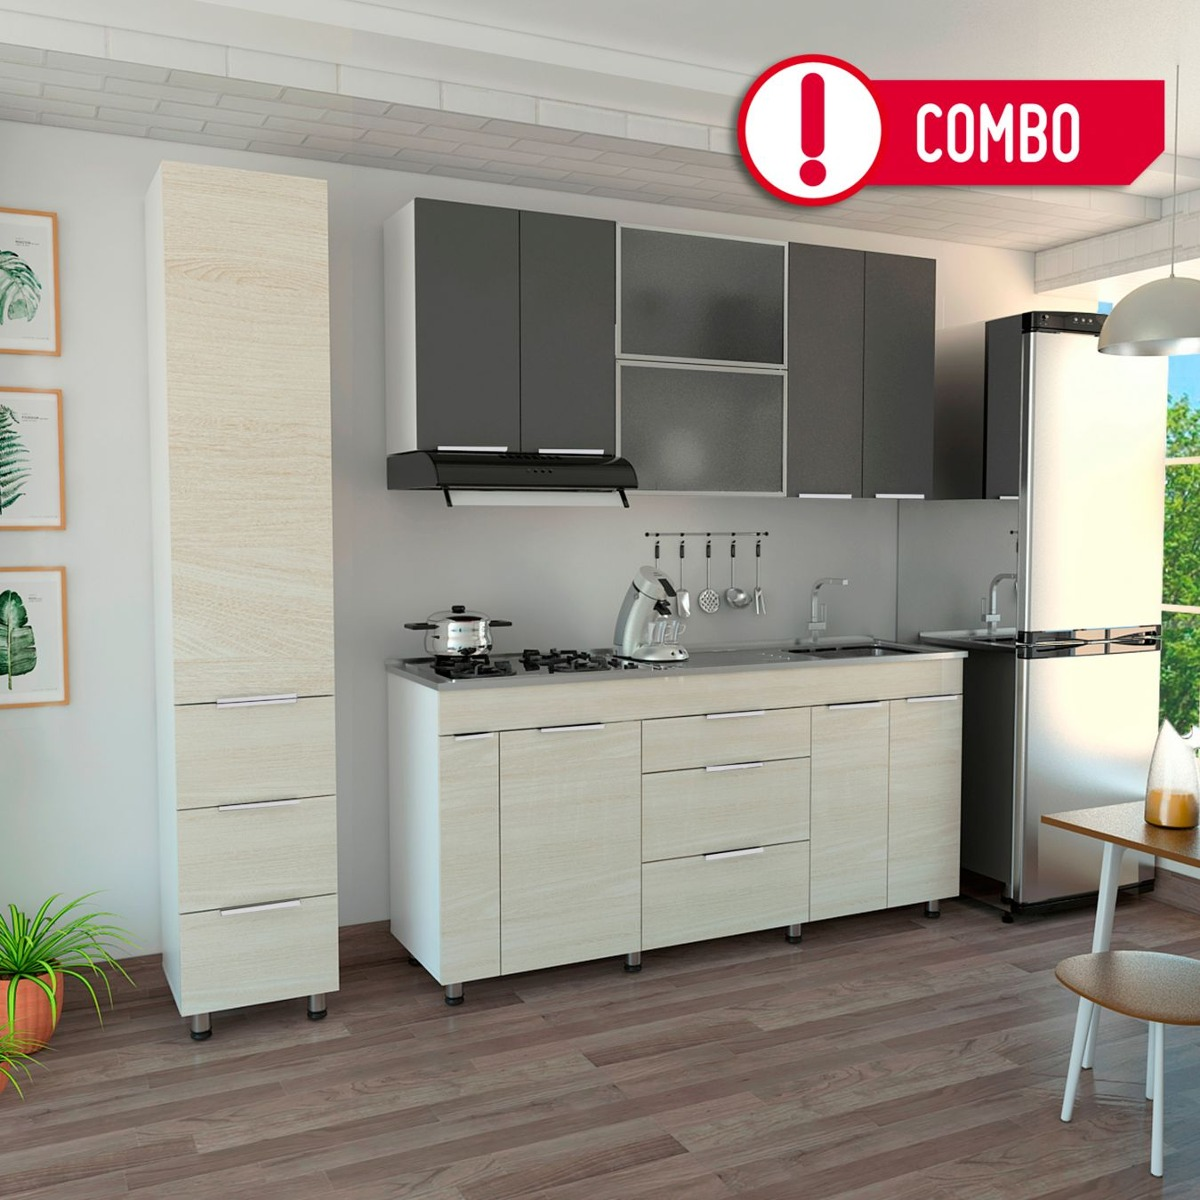 Rta Cocina Integral Milano Mueble Superior 1.80 Metros Tdt2 ...